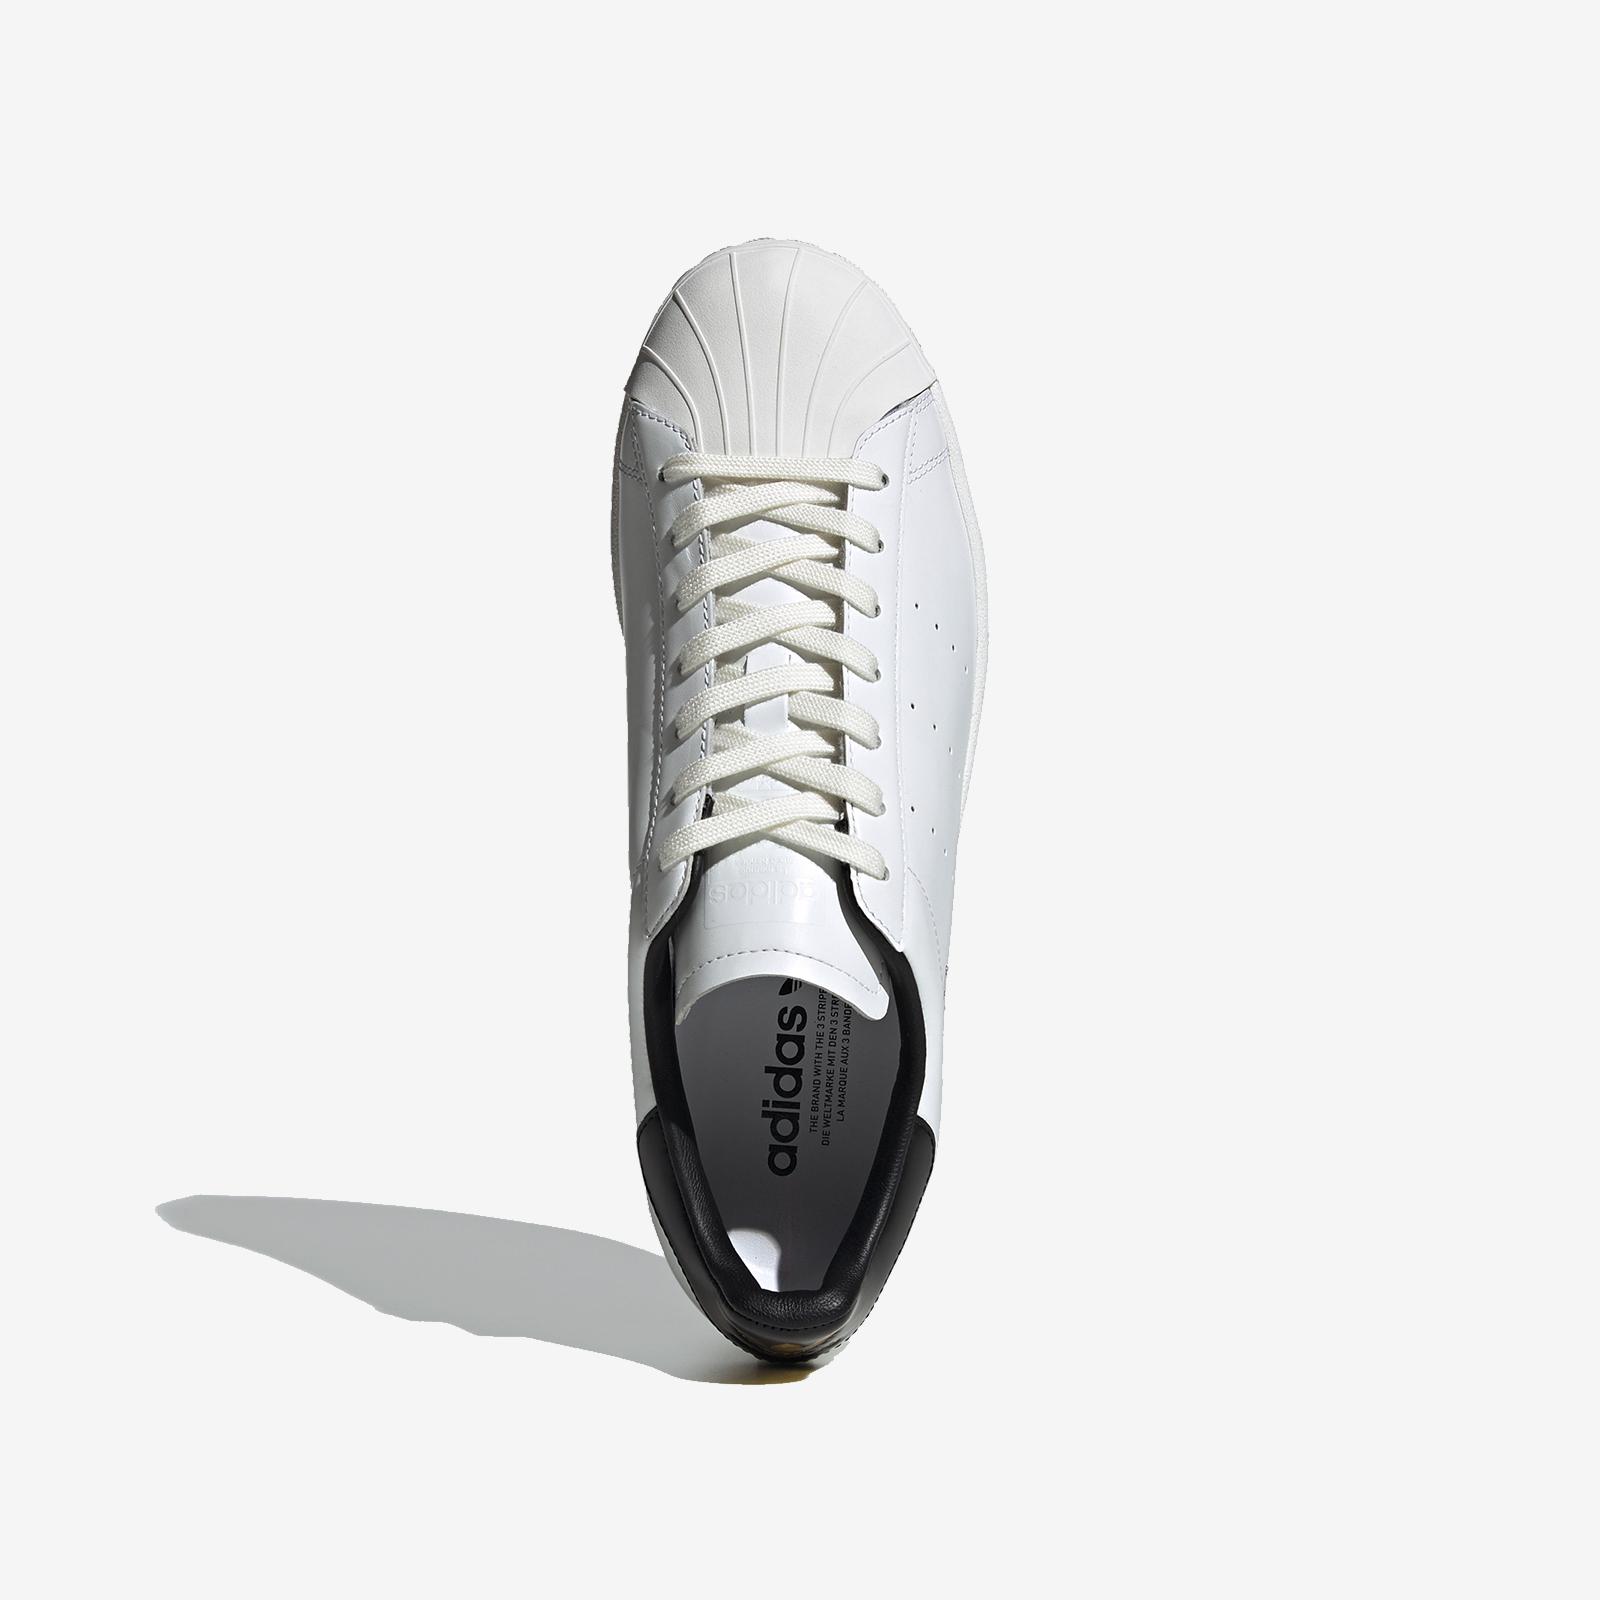 adidas superstar limited edition shop online